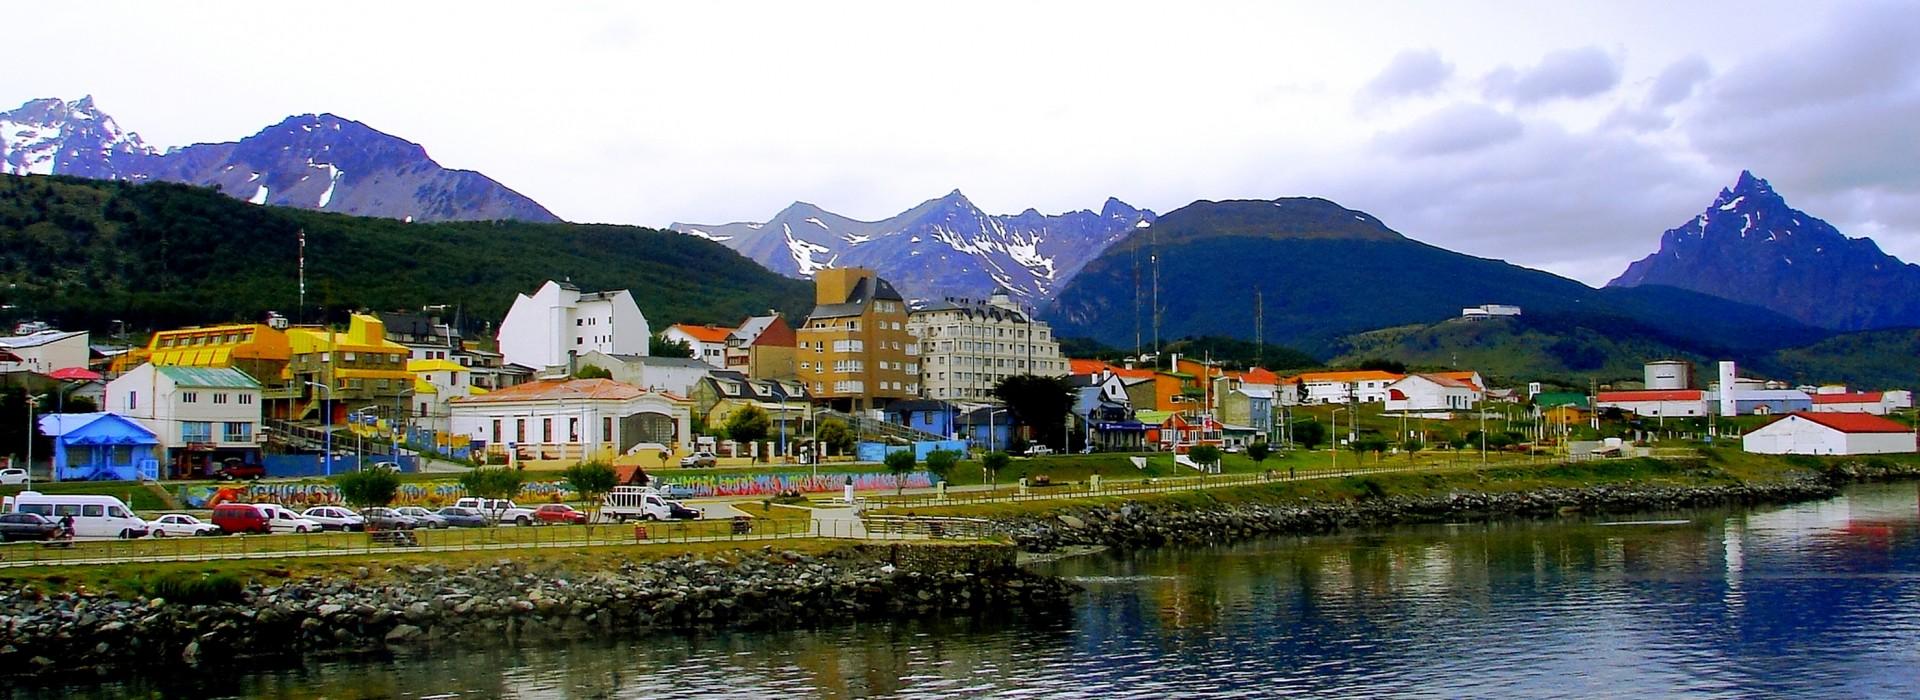 Ushuaia Tours and Holidays 2019/2020